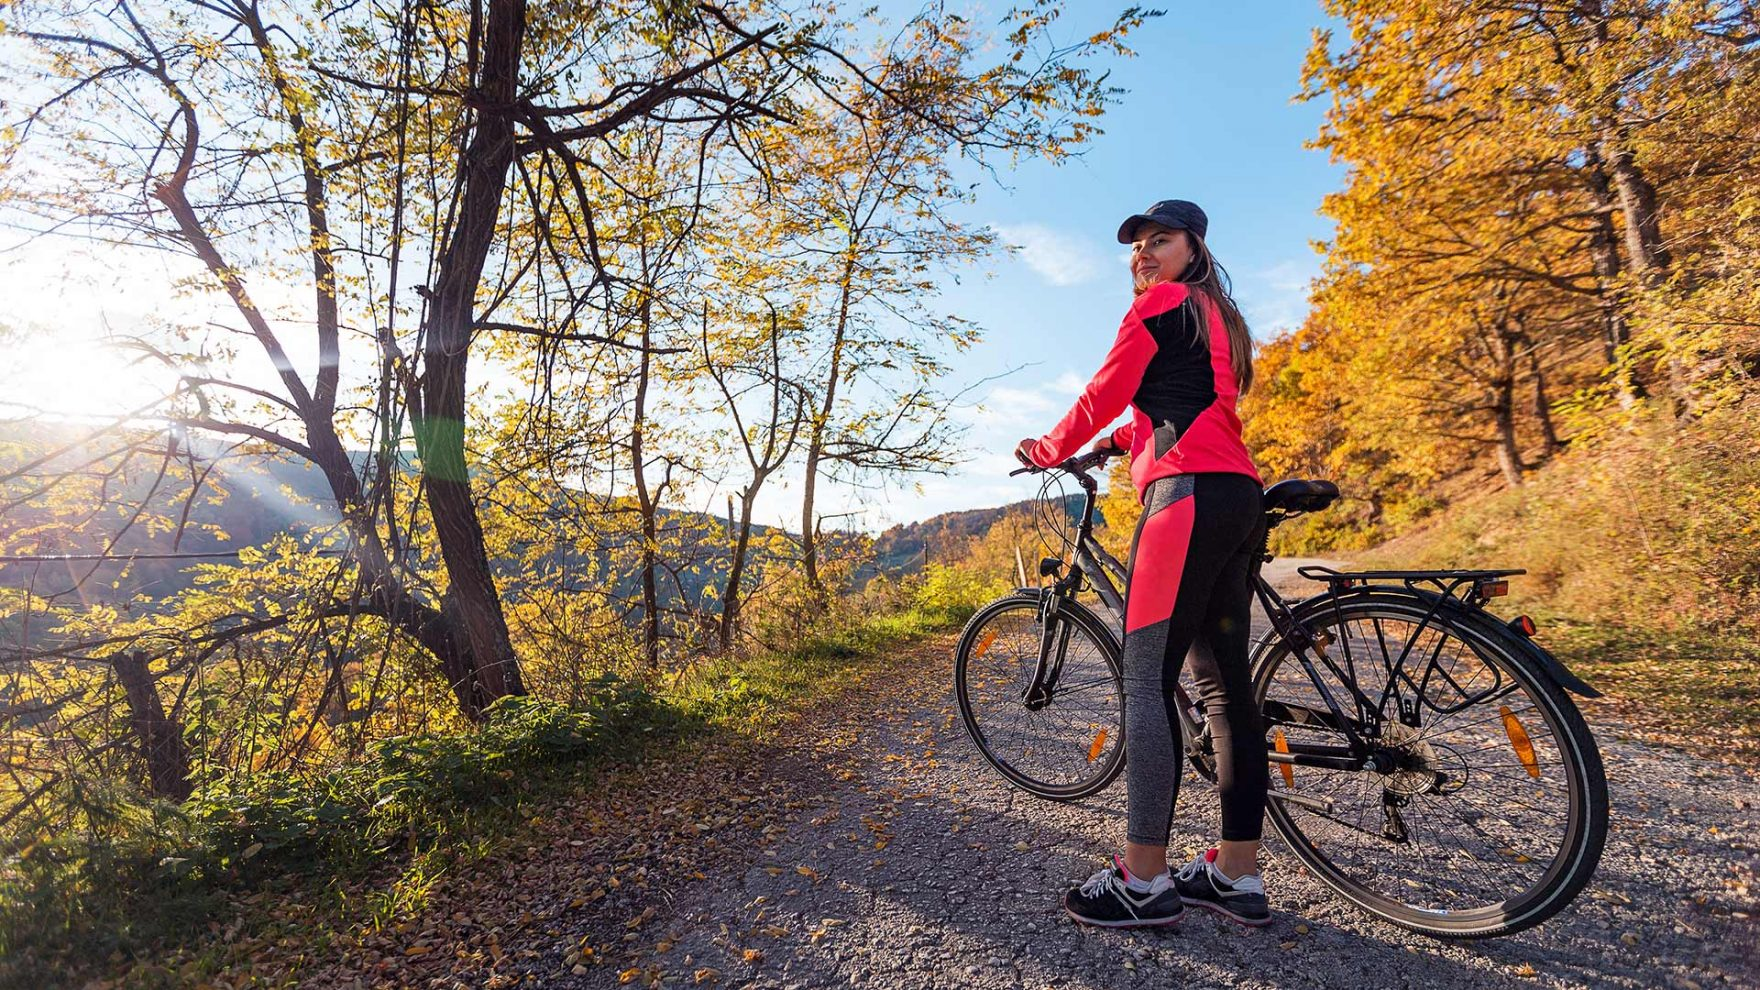 Vacanze d'autunno a Merano e dintorni -Vacanze in bici